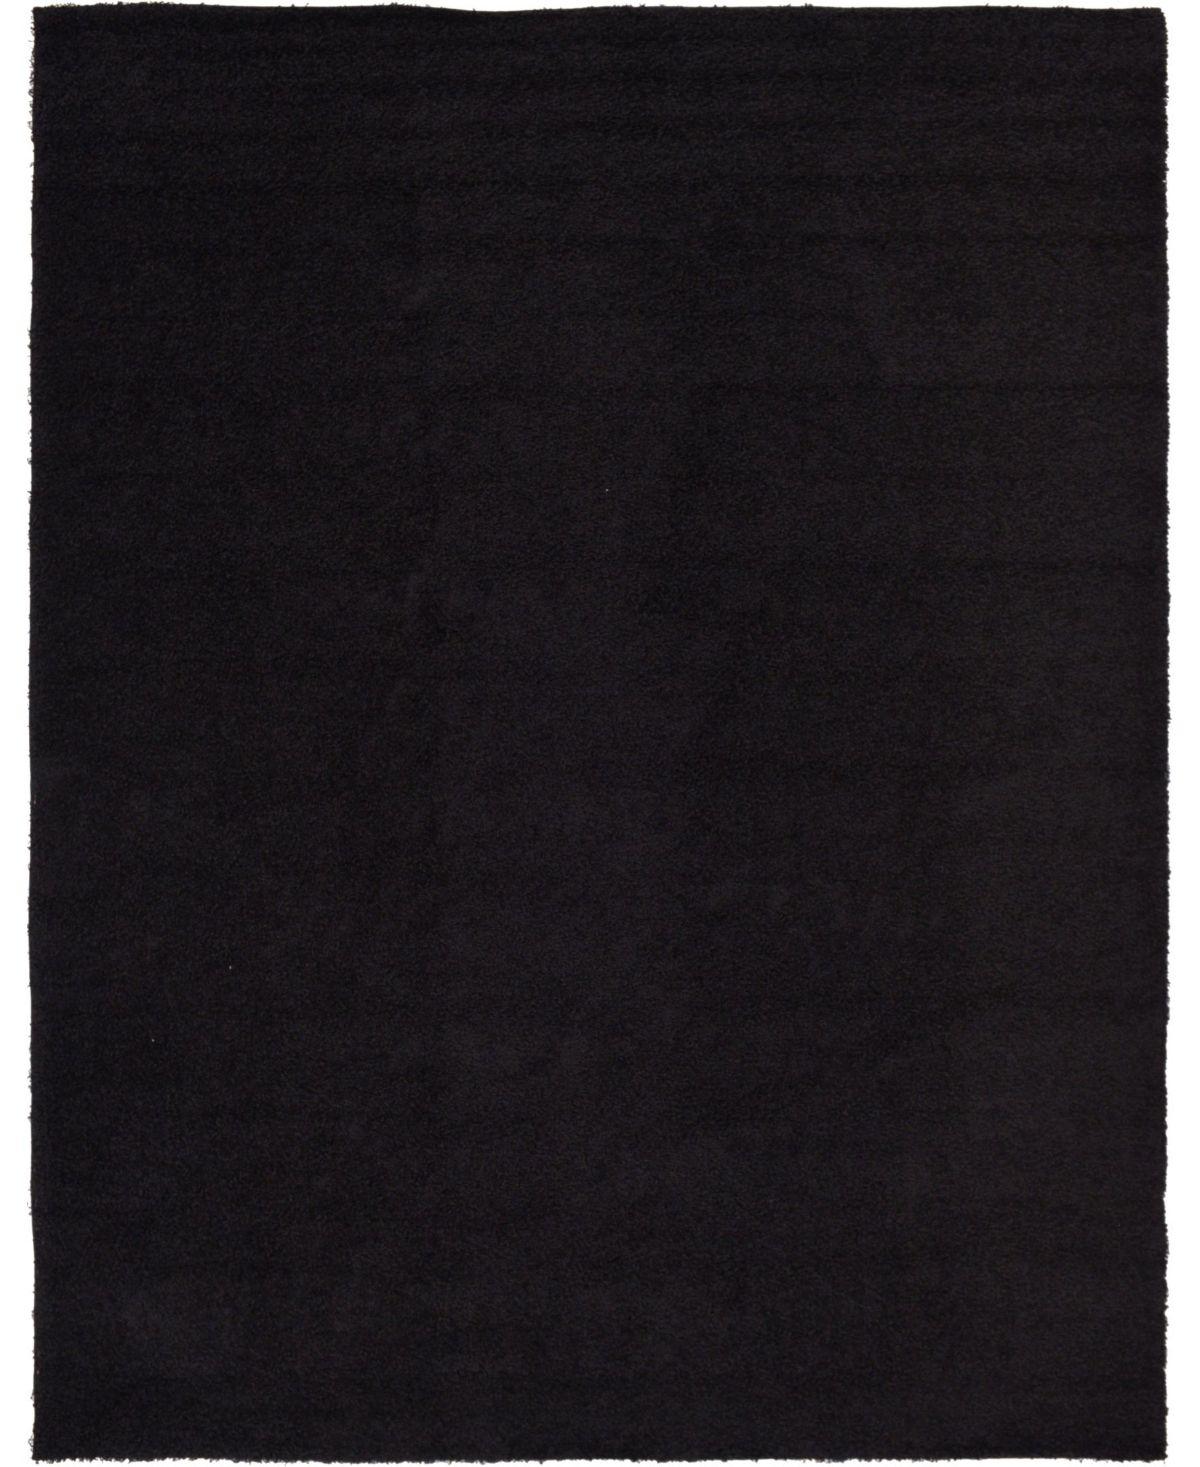 Photo of Bridgeport Home Exakte Shag Exs1 Jet Black 10 'x 13' Teppich & Bewertungen – Teppiche – Macy's